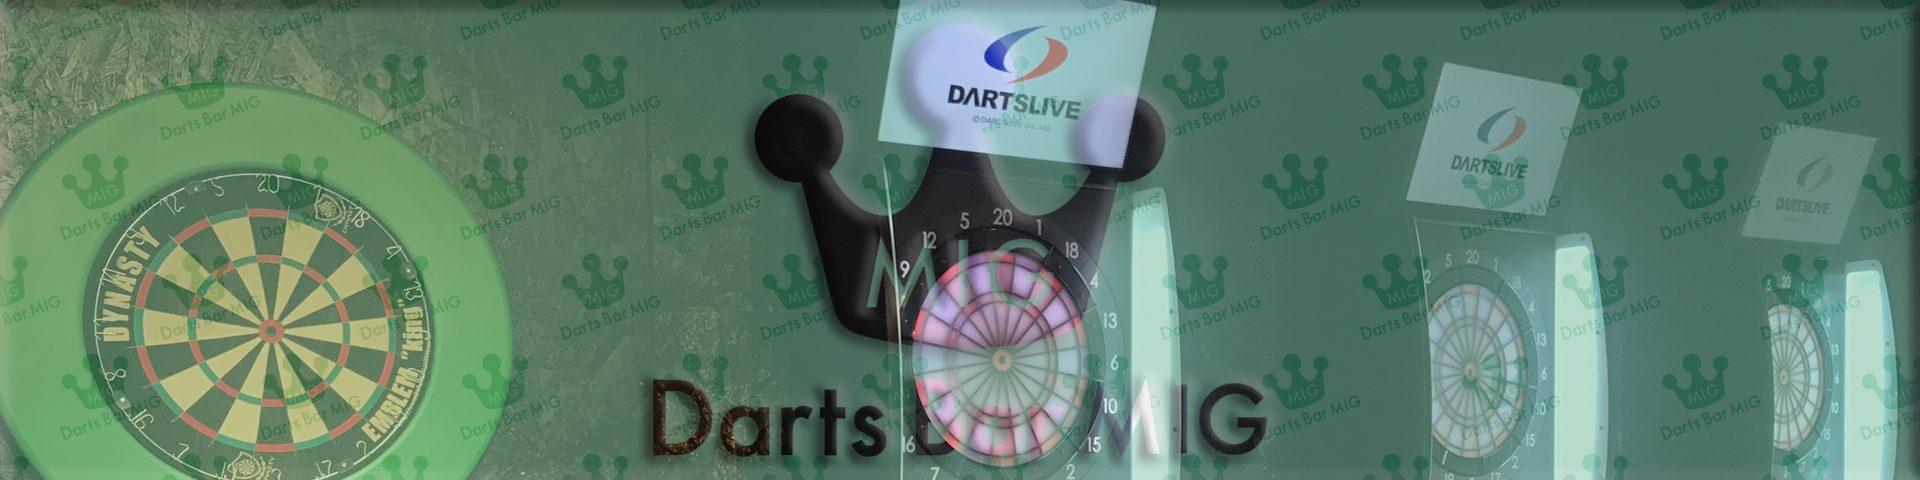 Darts Bar MIG